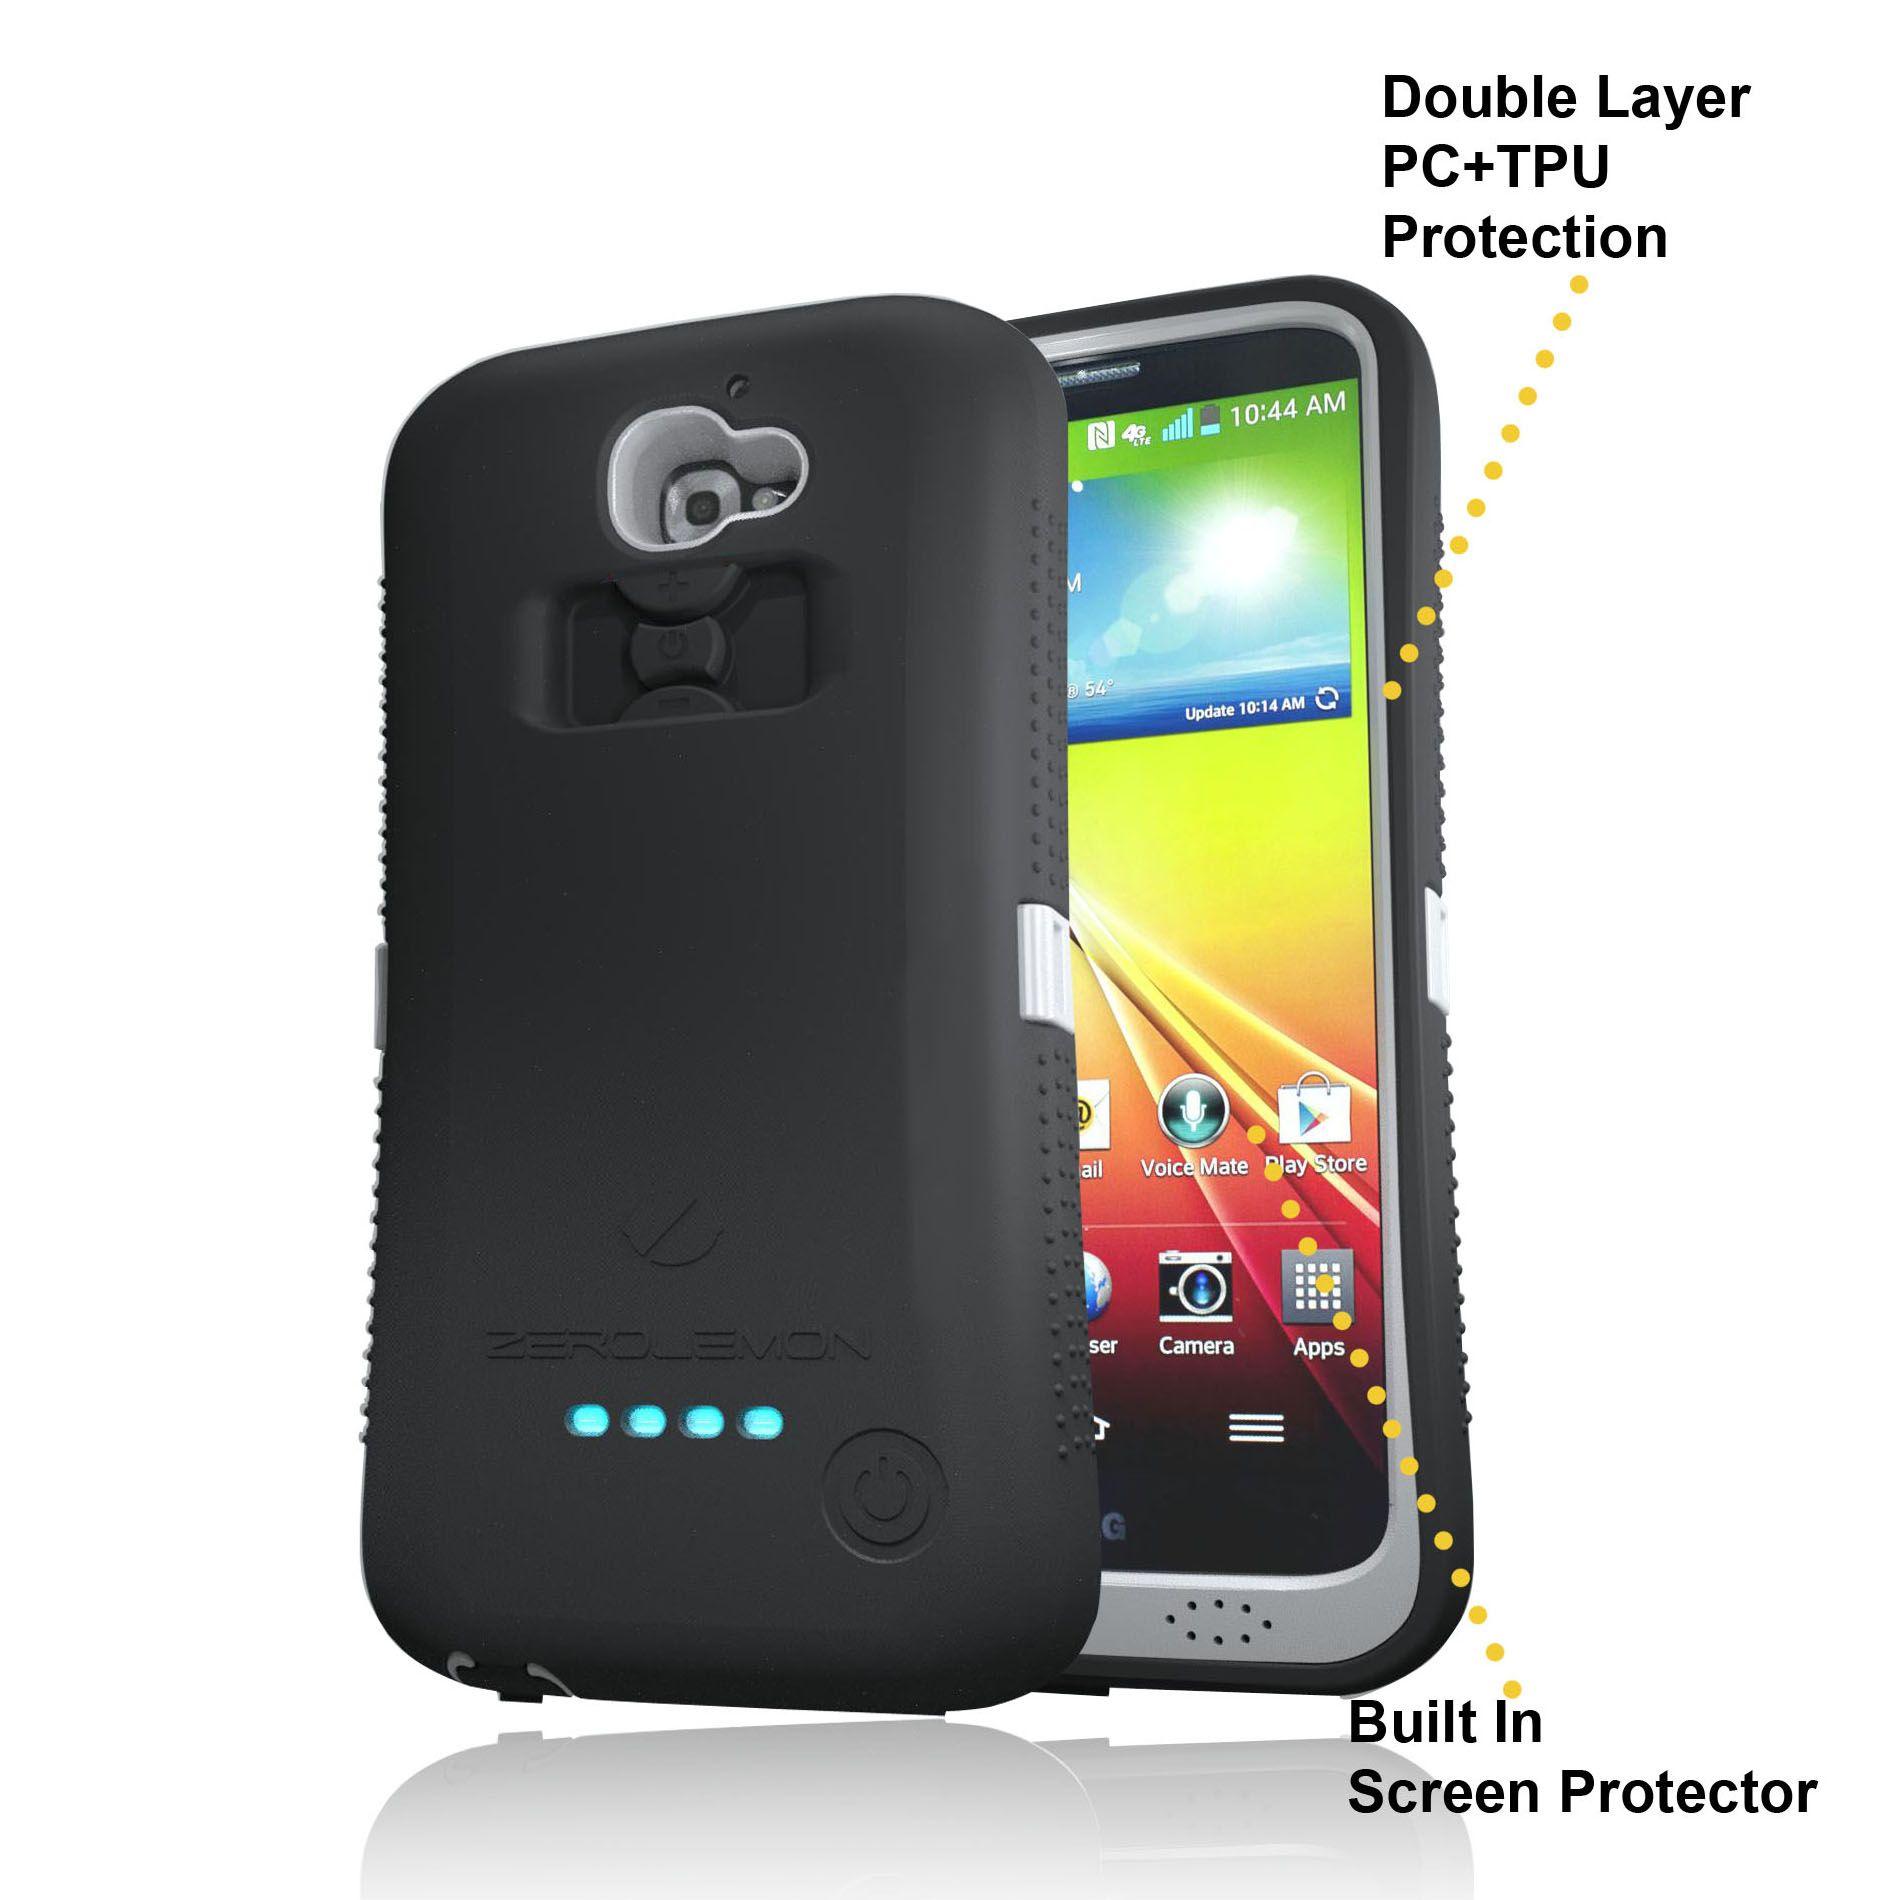 finest selection 1feee 35234 ZeroLemon ZeroShock Gray/Black Dual Layer Rugged Case + Screen ...